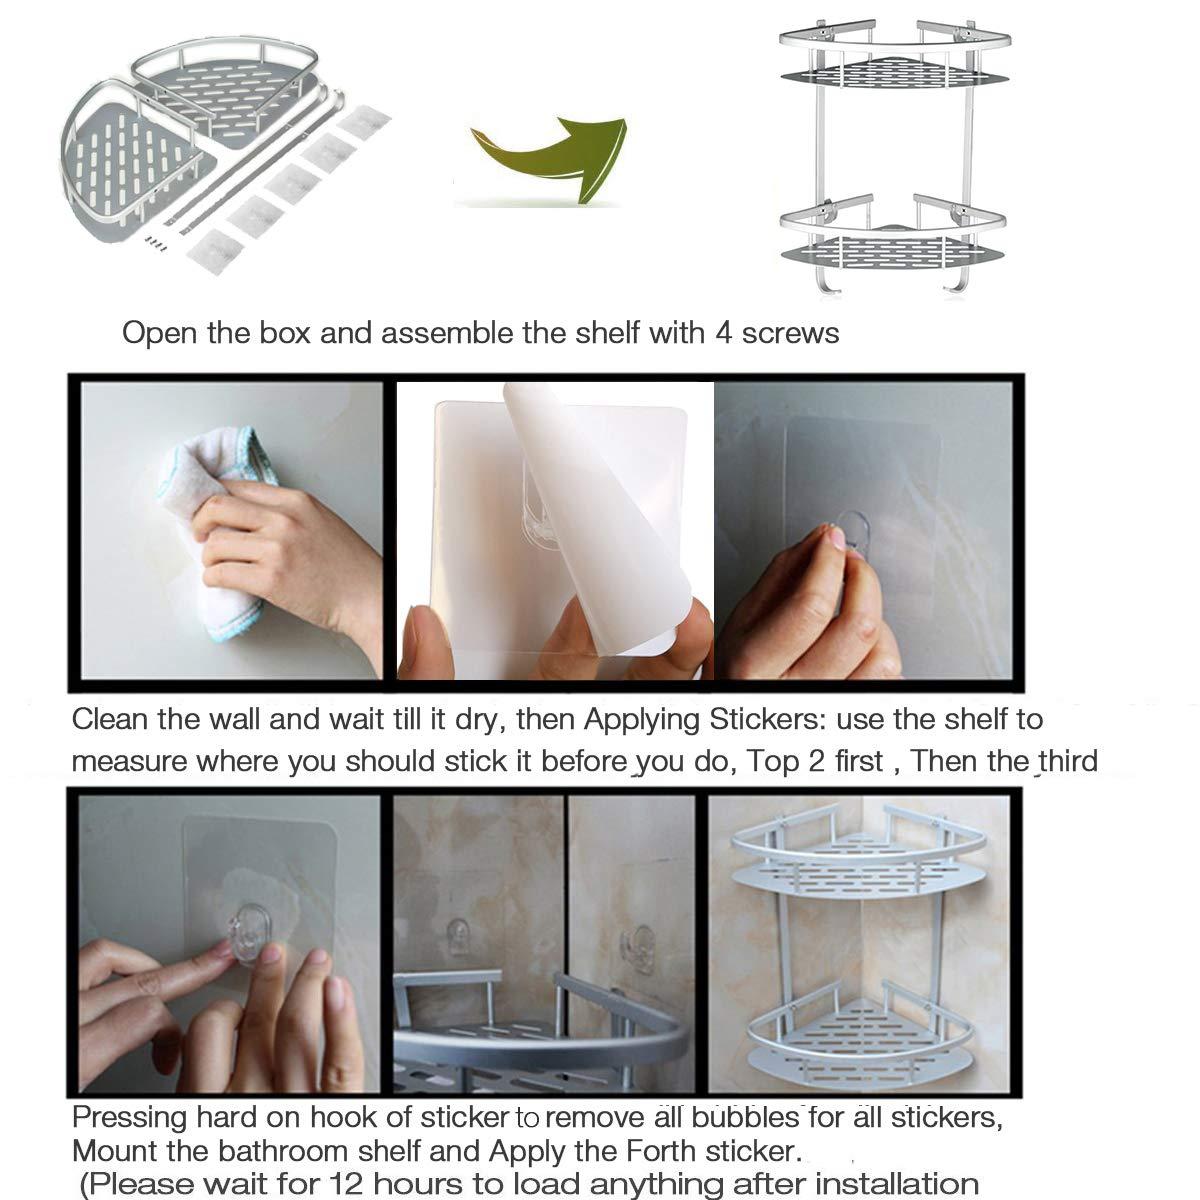 Lancher Bathroom Shelf (No Drilling) Durable Aluminum 2 Tiers Shower Shelf Kitchen Storage Basket Adhesive Suction Corner Shelves Shower Caddy 61Y8e0ECgSL